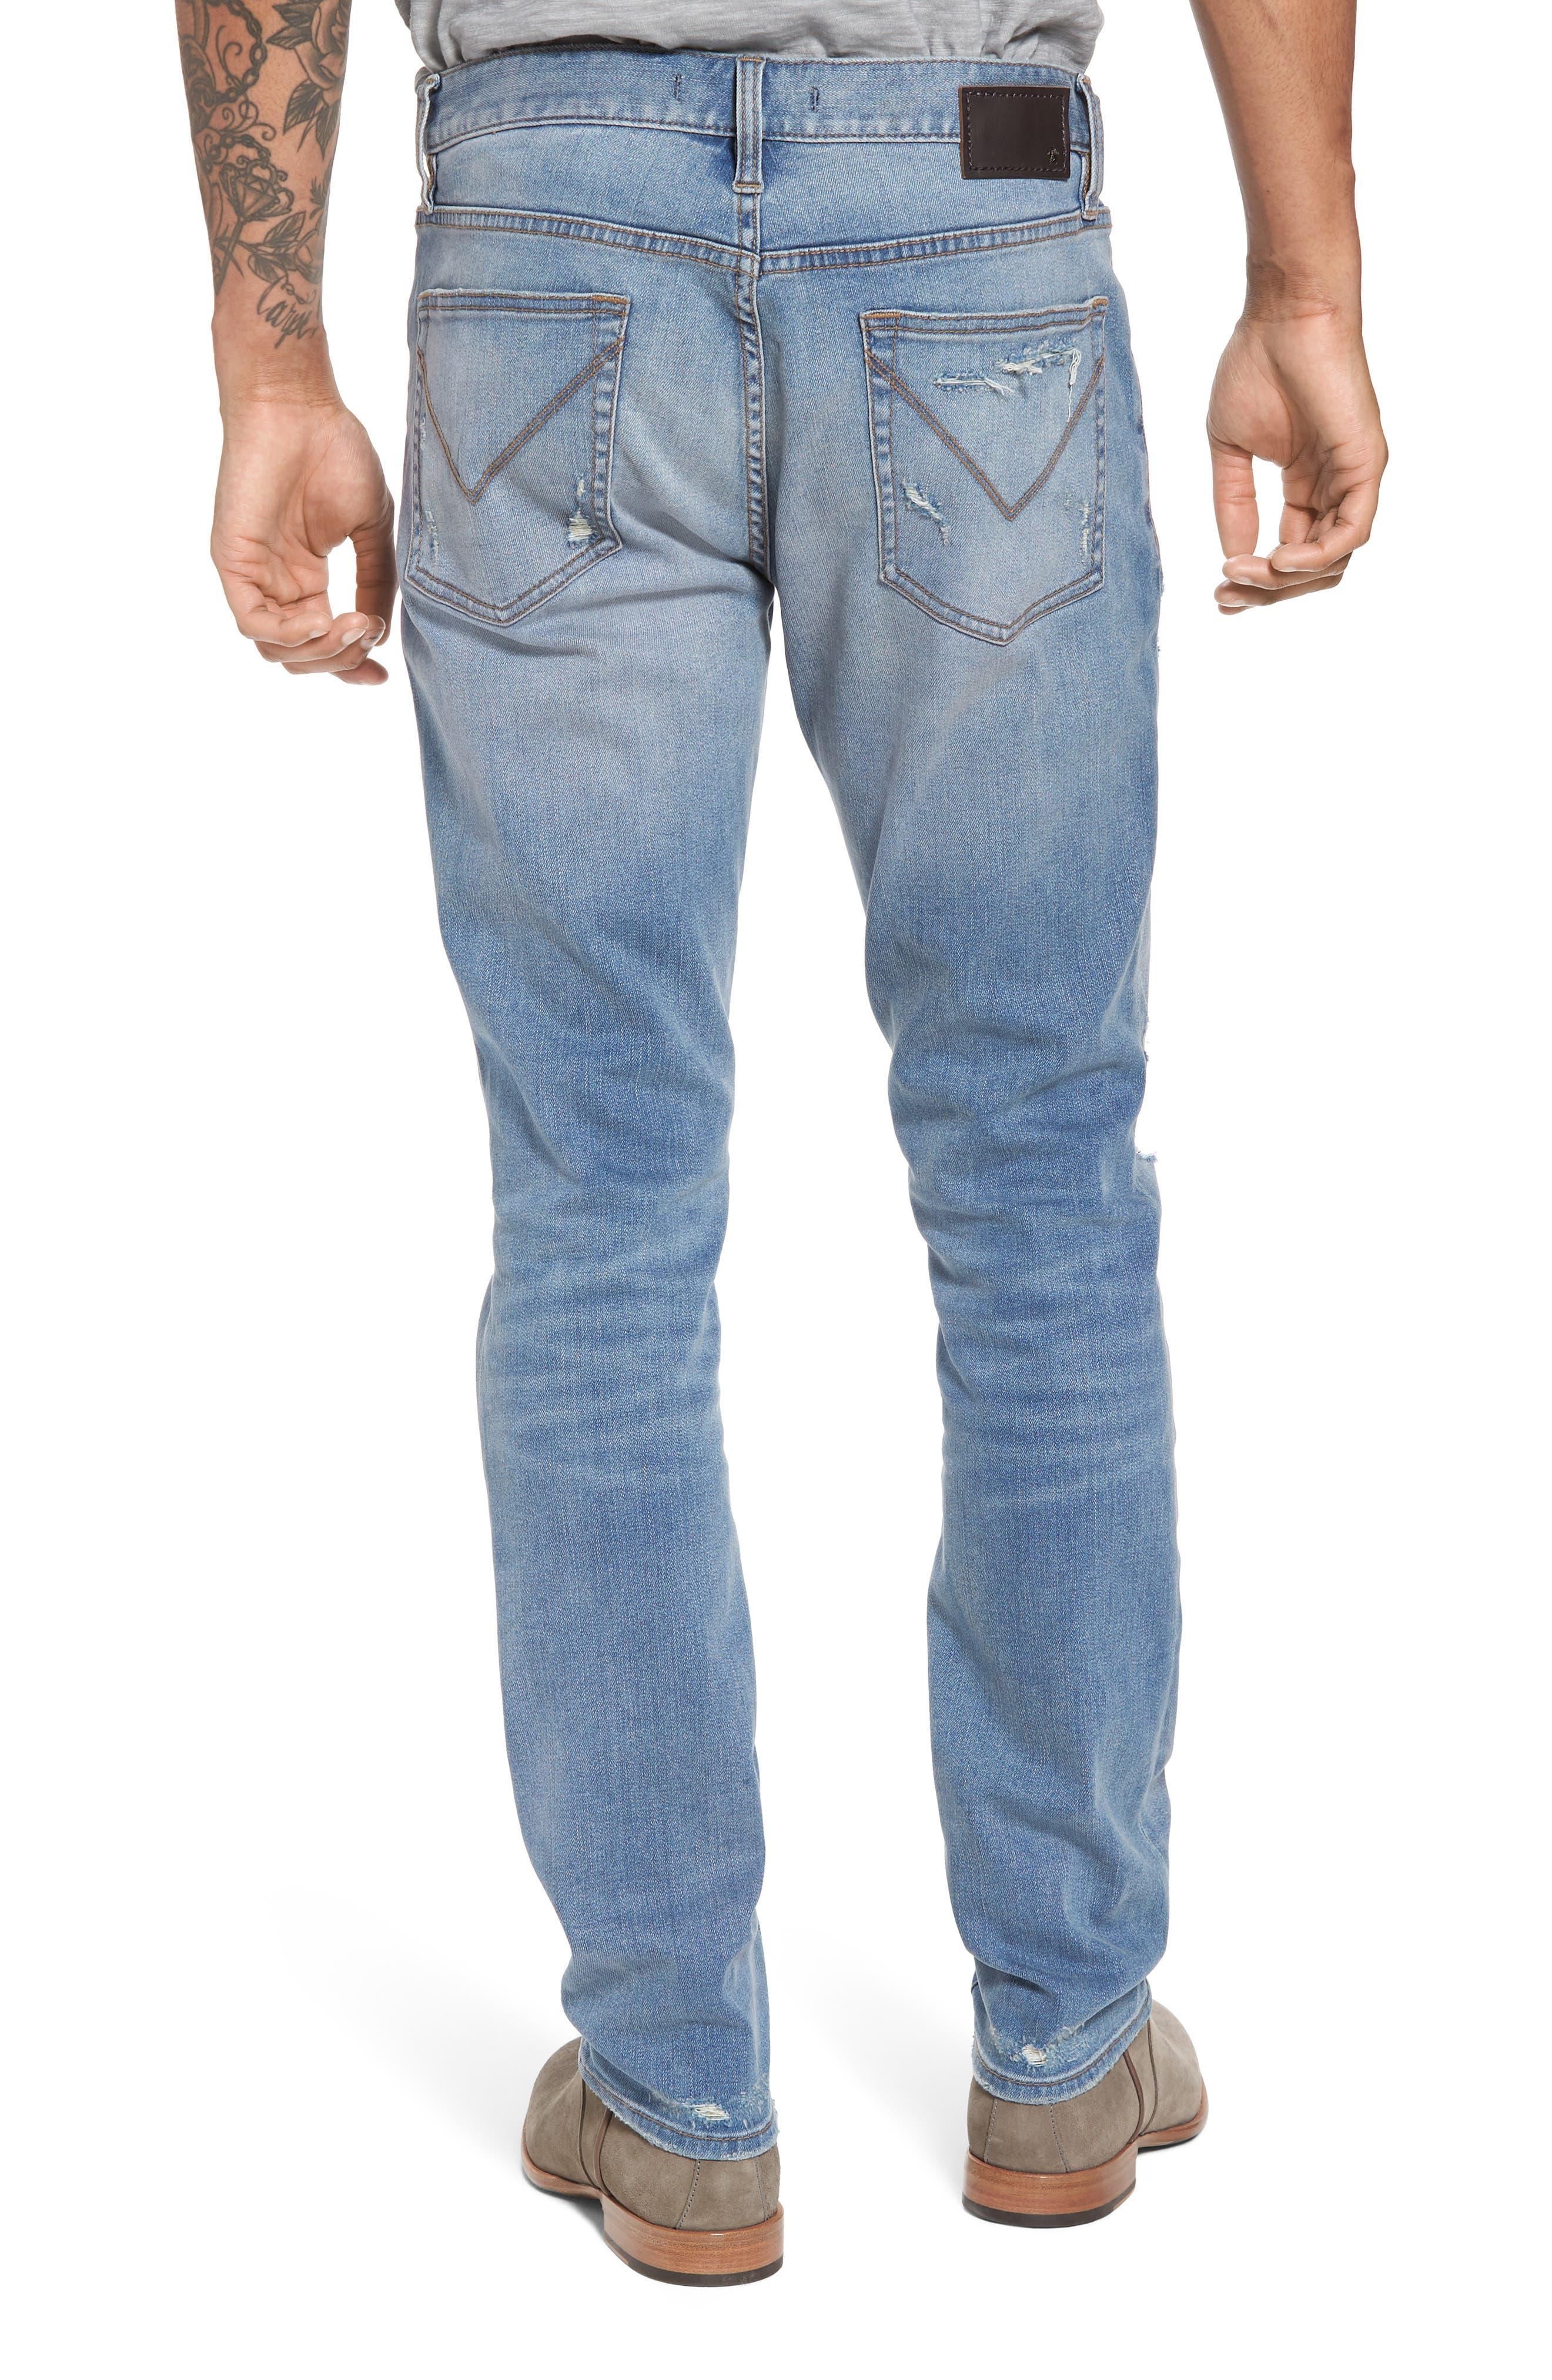 Wight Slim Fit Straight Leg Jeans,                             Alternate thumbnail 2, color,                             Atlantic Blue